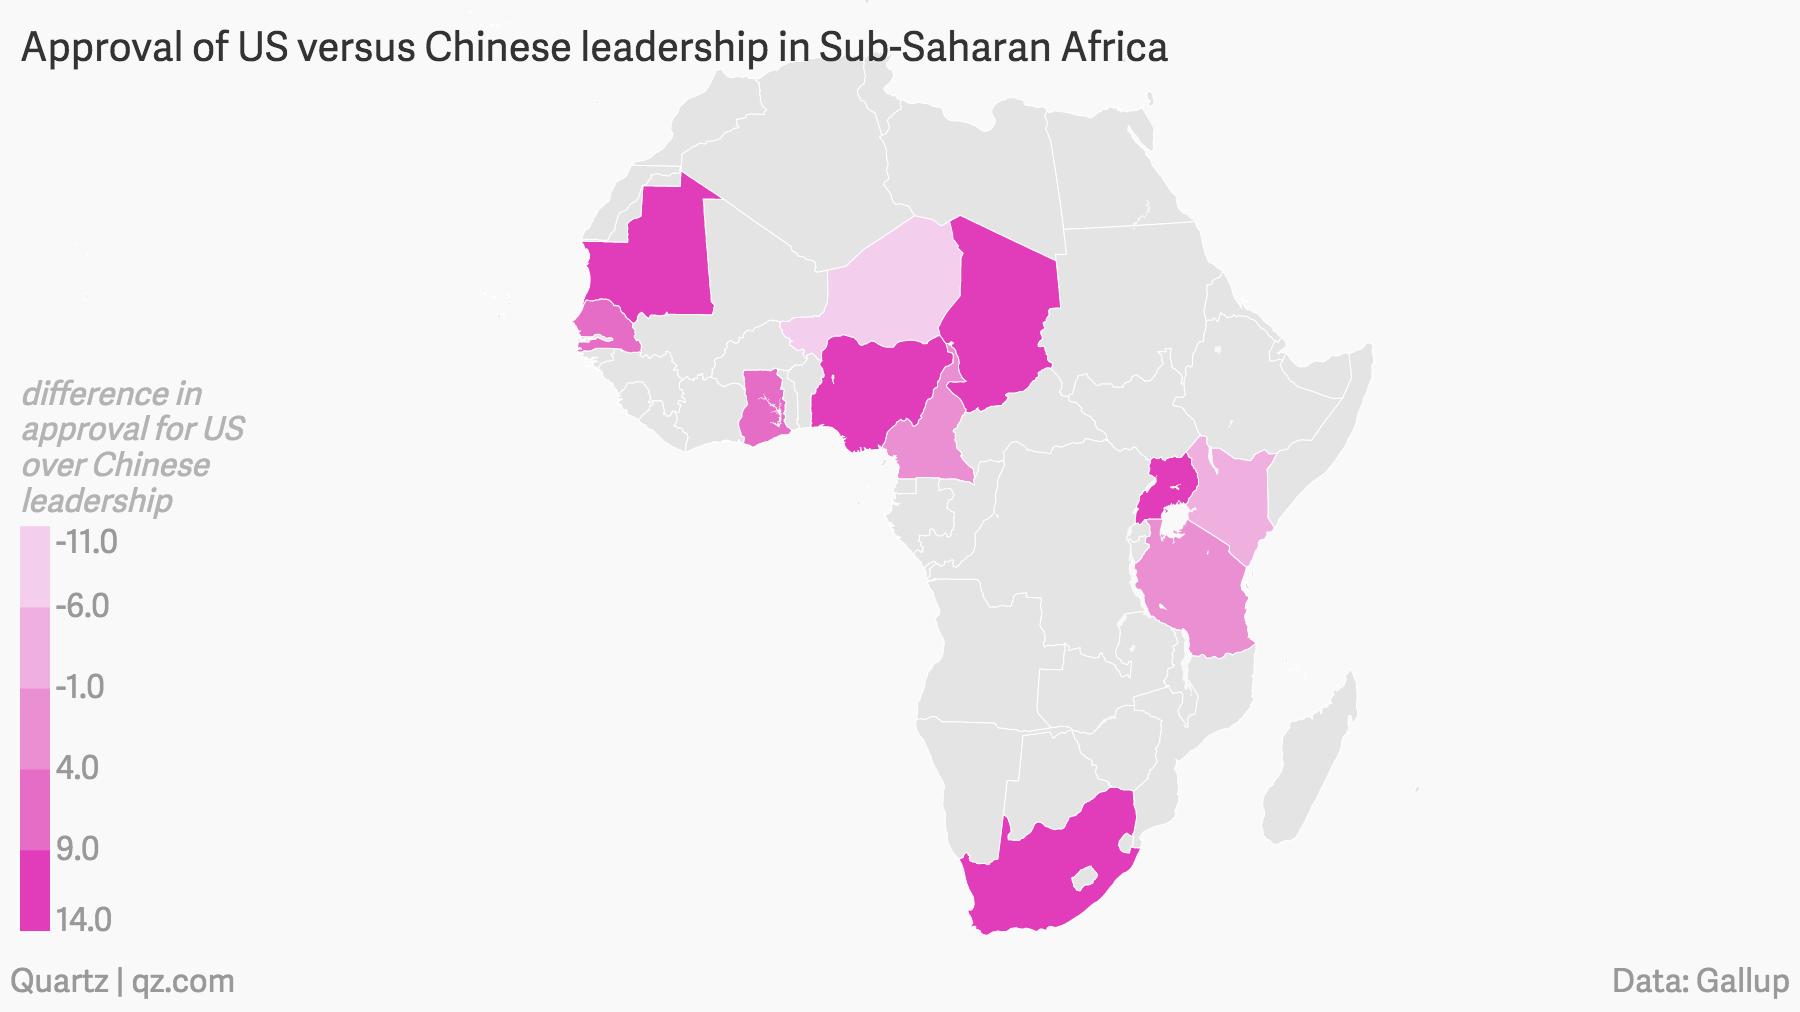 Approval-of-US-versus-Chinese-leadership-in-Sub-Saharan-Africa_mapbuilder